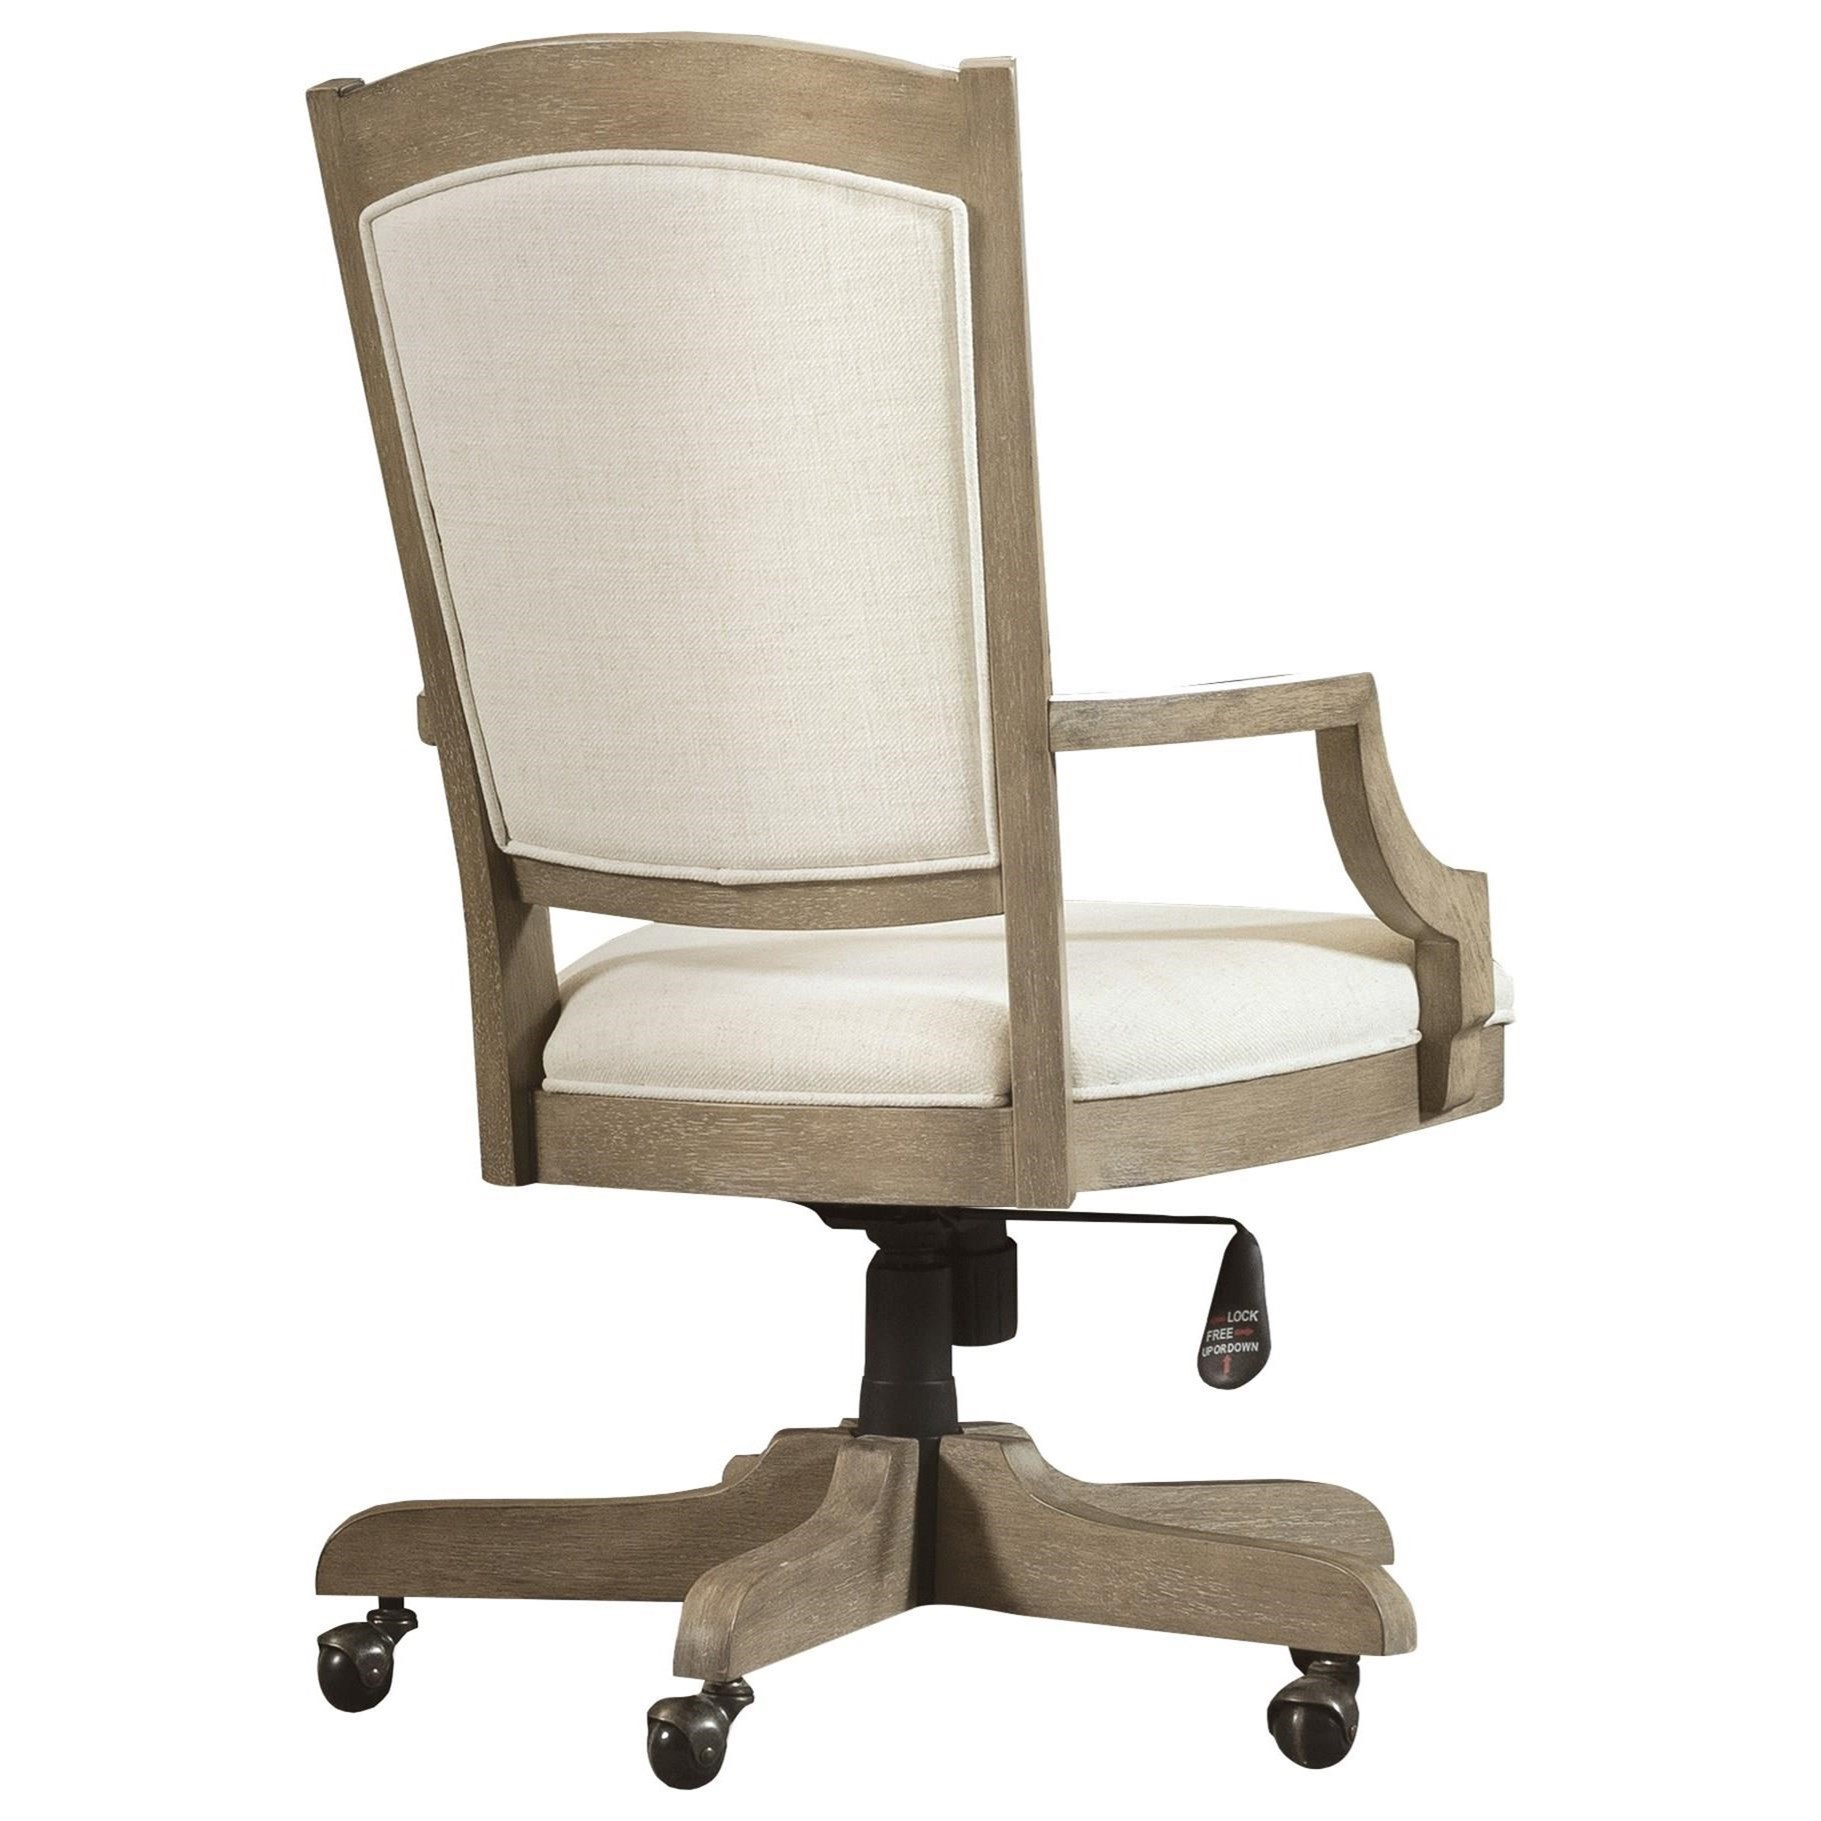 Myra Upholstered Desk Chair by Riverside Furniture at Johnny Janosik